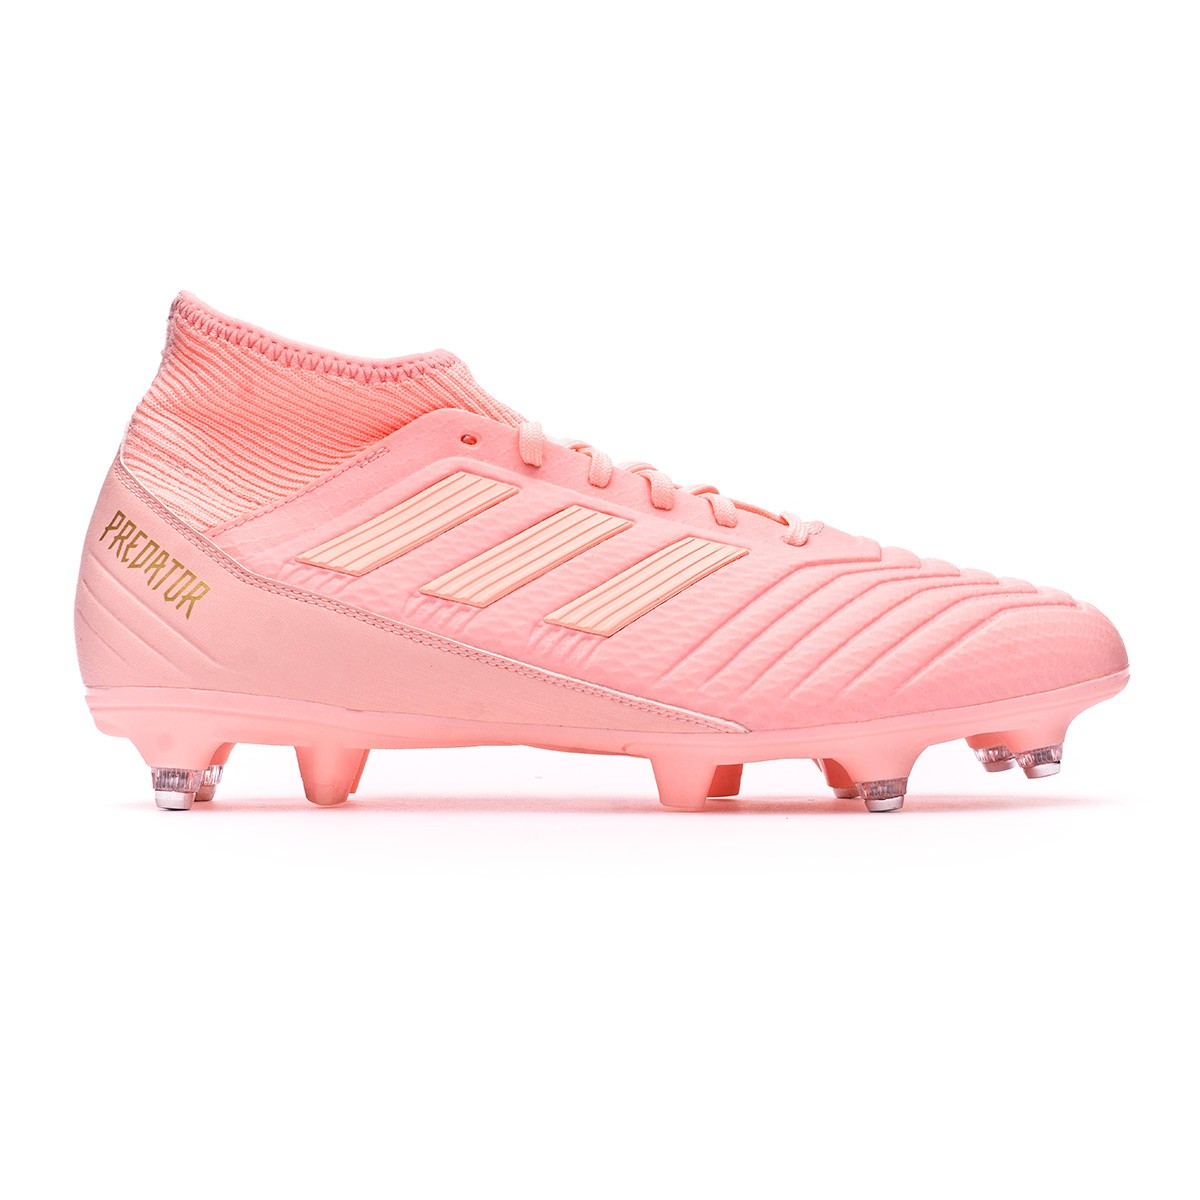 ... Bota Predator 18.3 SG Clear orange-Trace pink. CATEGORY. Football Boots  · adidas boots 0a2e6c006fc0f